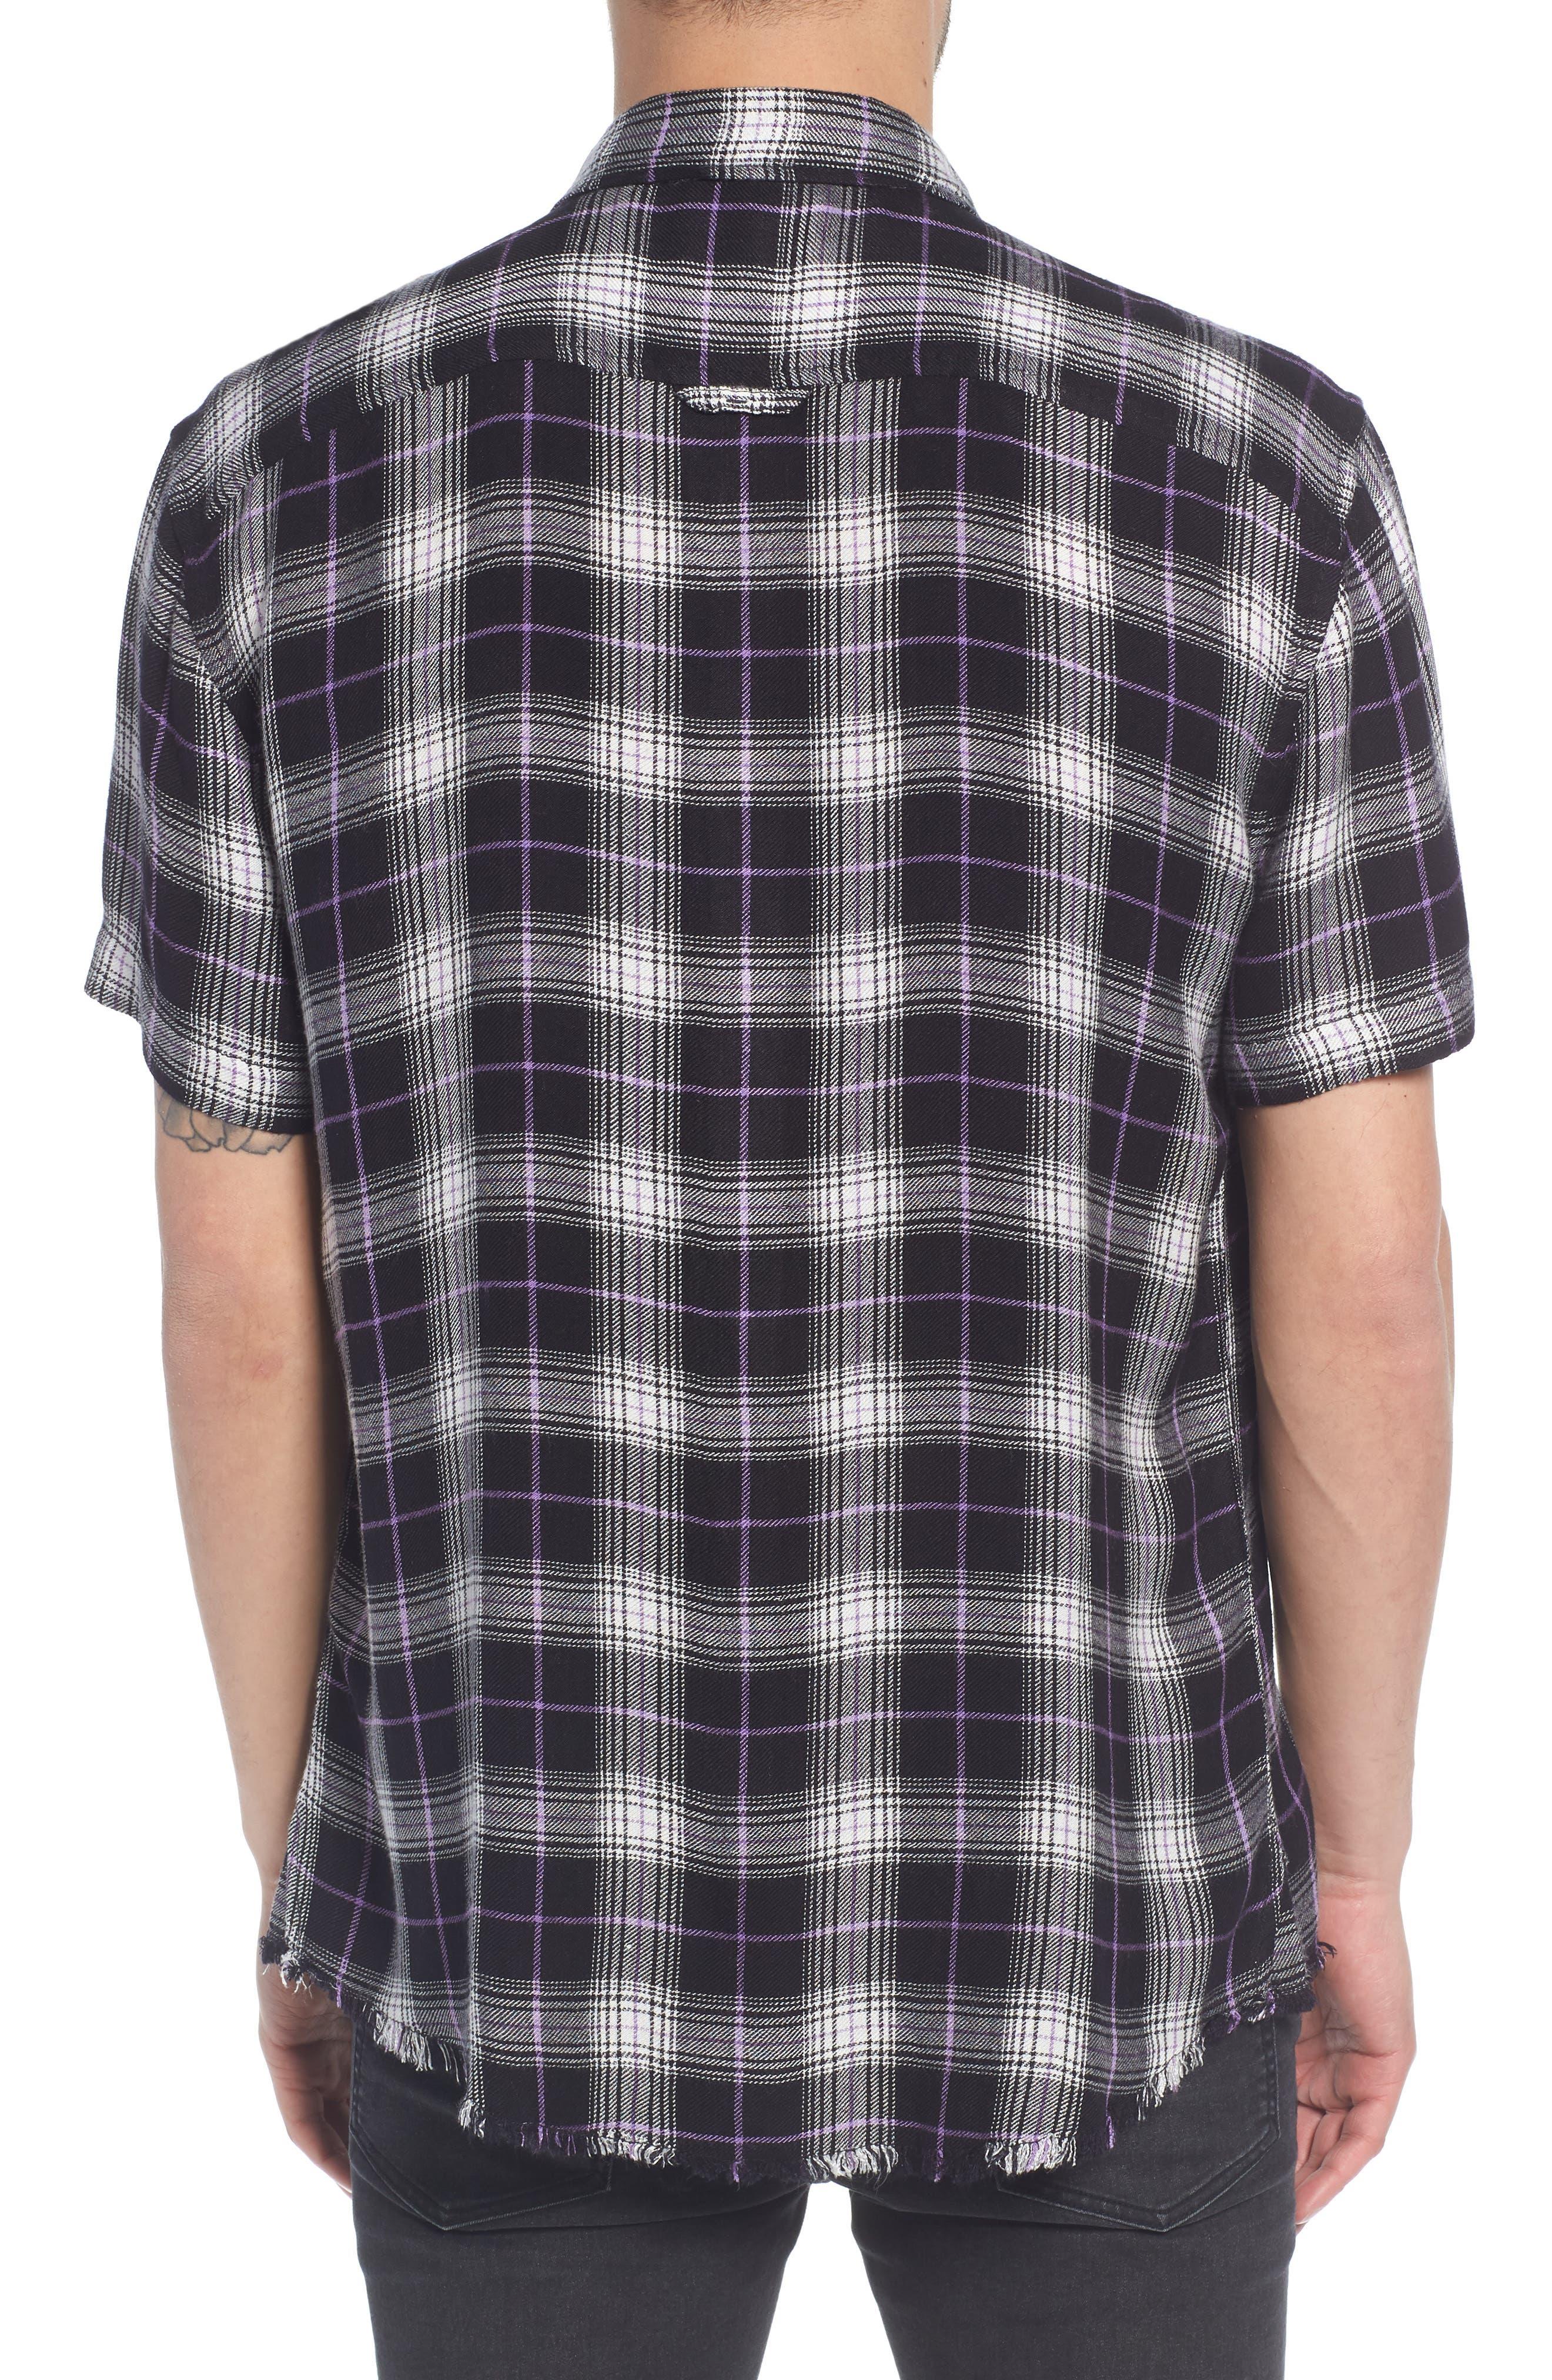 Drapey Plaid Short Sleeve Shirt,                             Alternate thumbnail 2, color,                             BLACK ROCK CODY PLAID